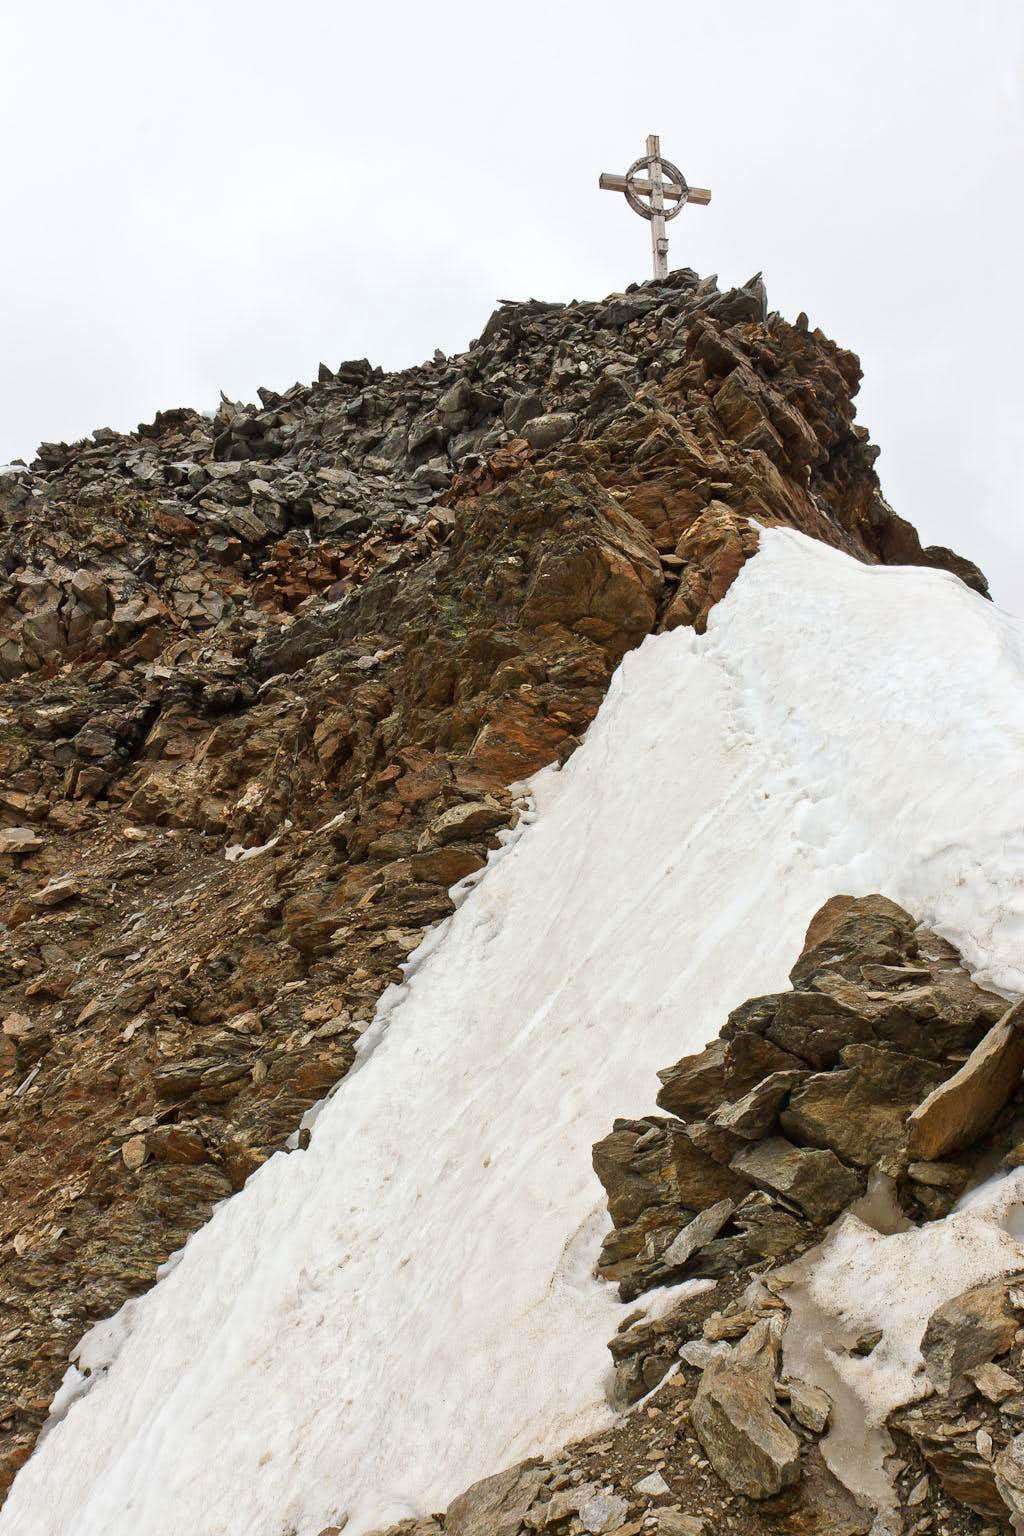 Summit cross of Hinterer Seelenkogel